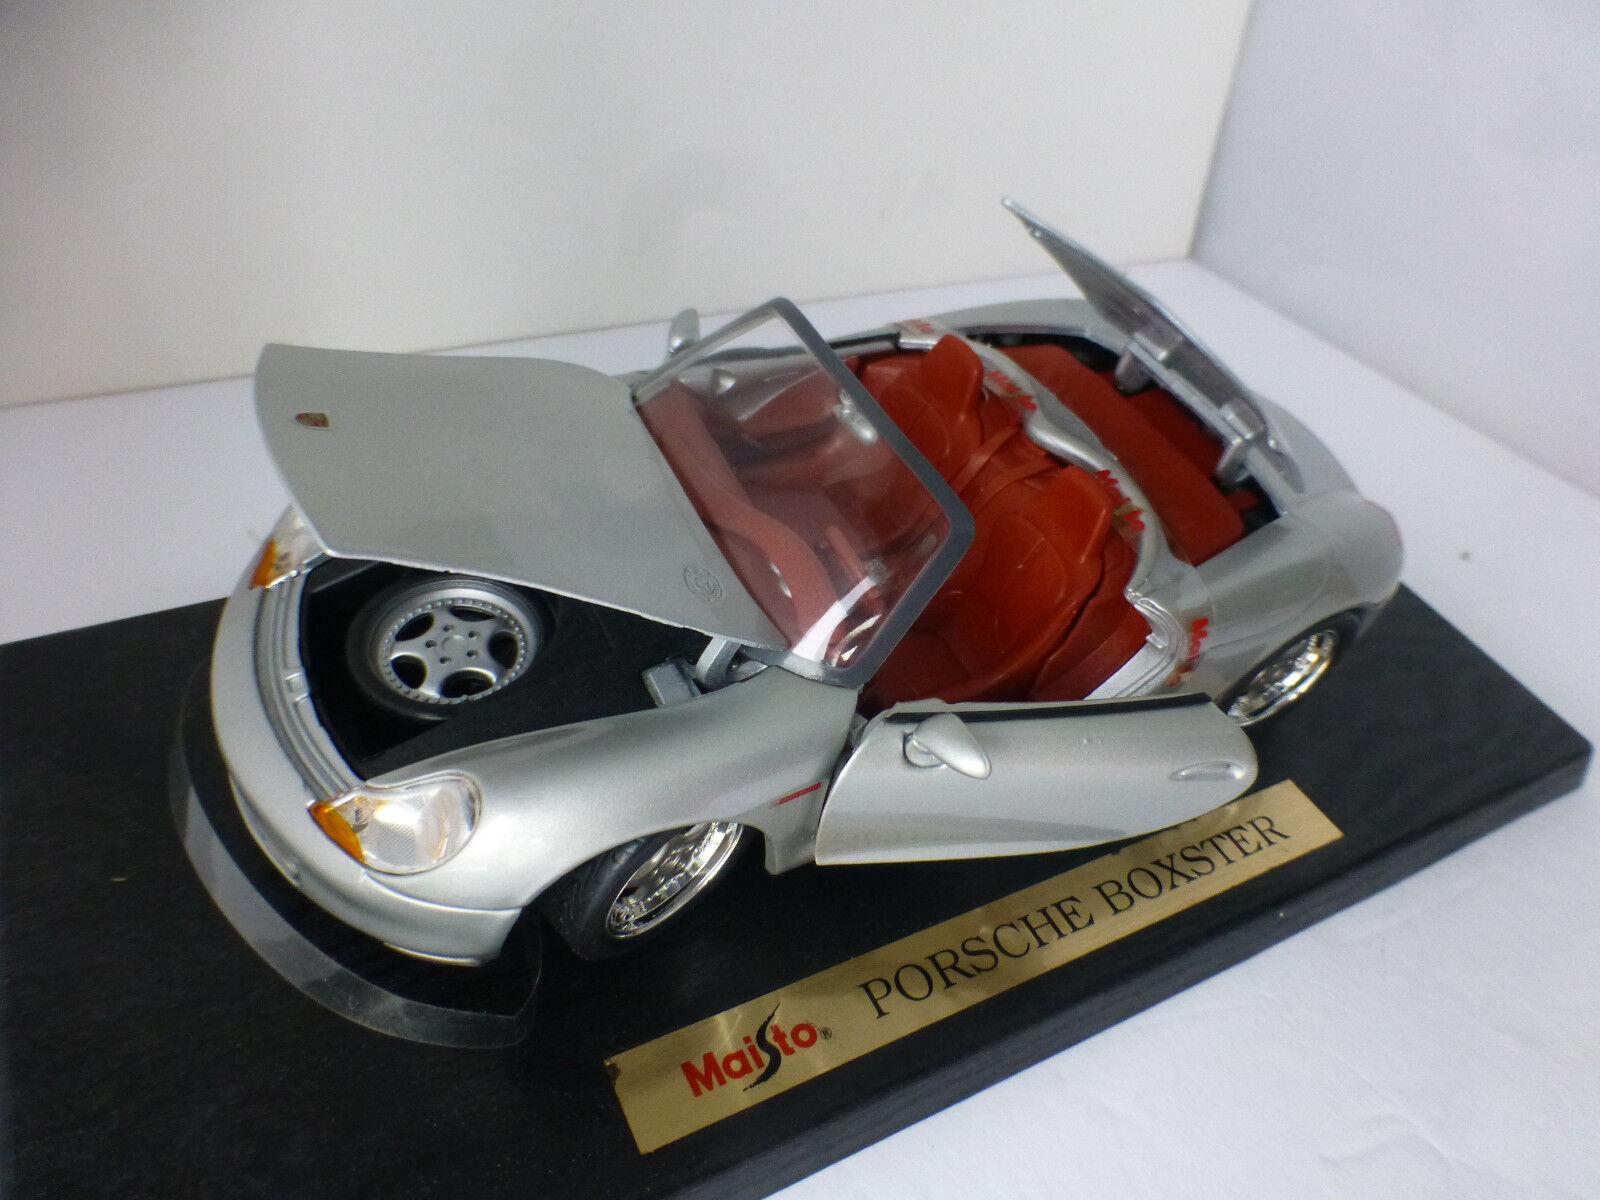 Maisto Porsche Boxster Plata 1 18 escala Capó Tronco y puertas abiertas Original Concep